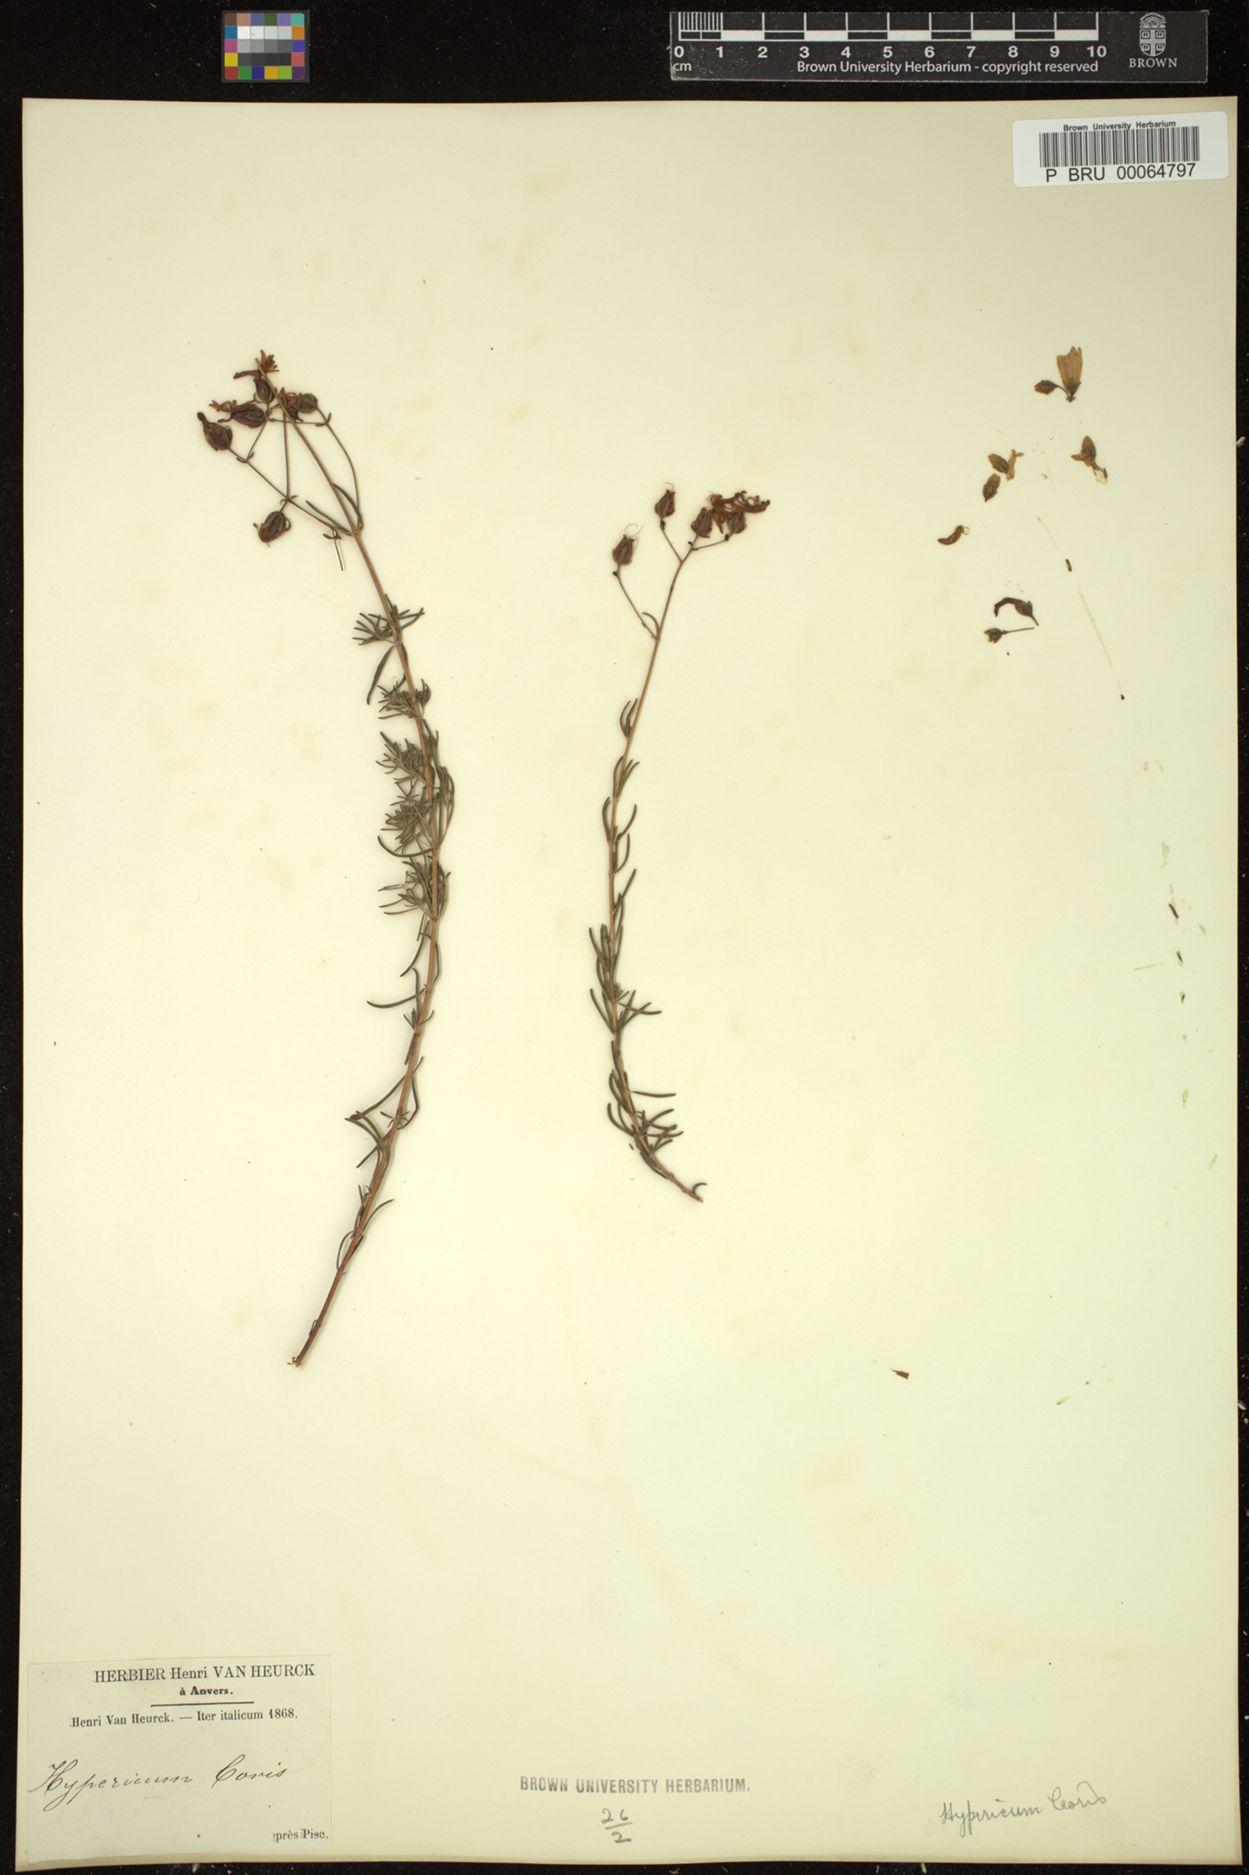 Hypericum coris image